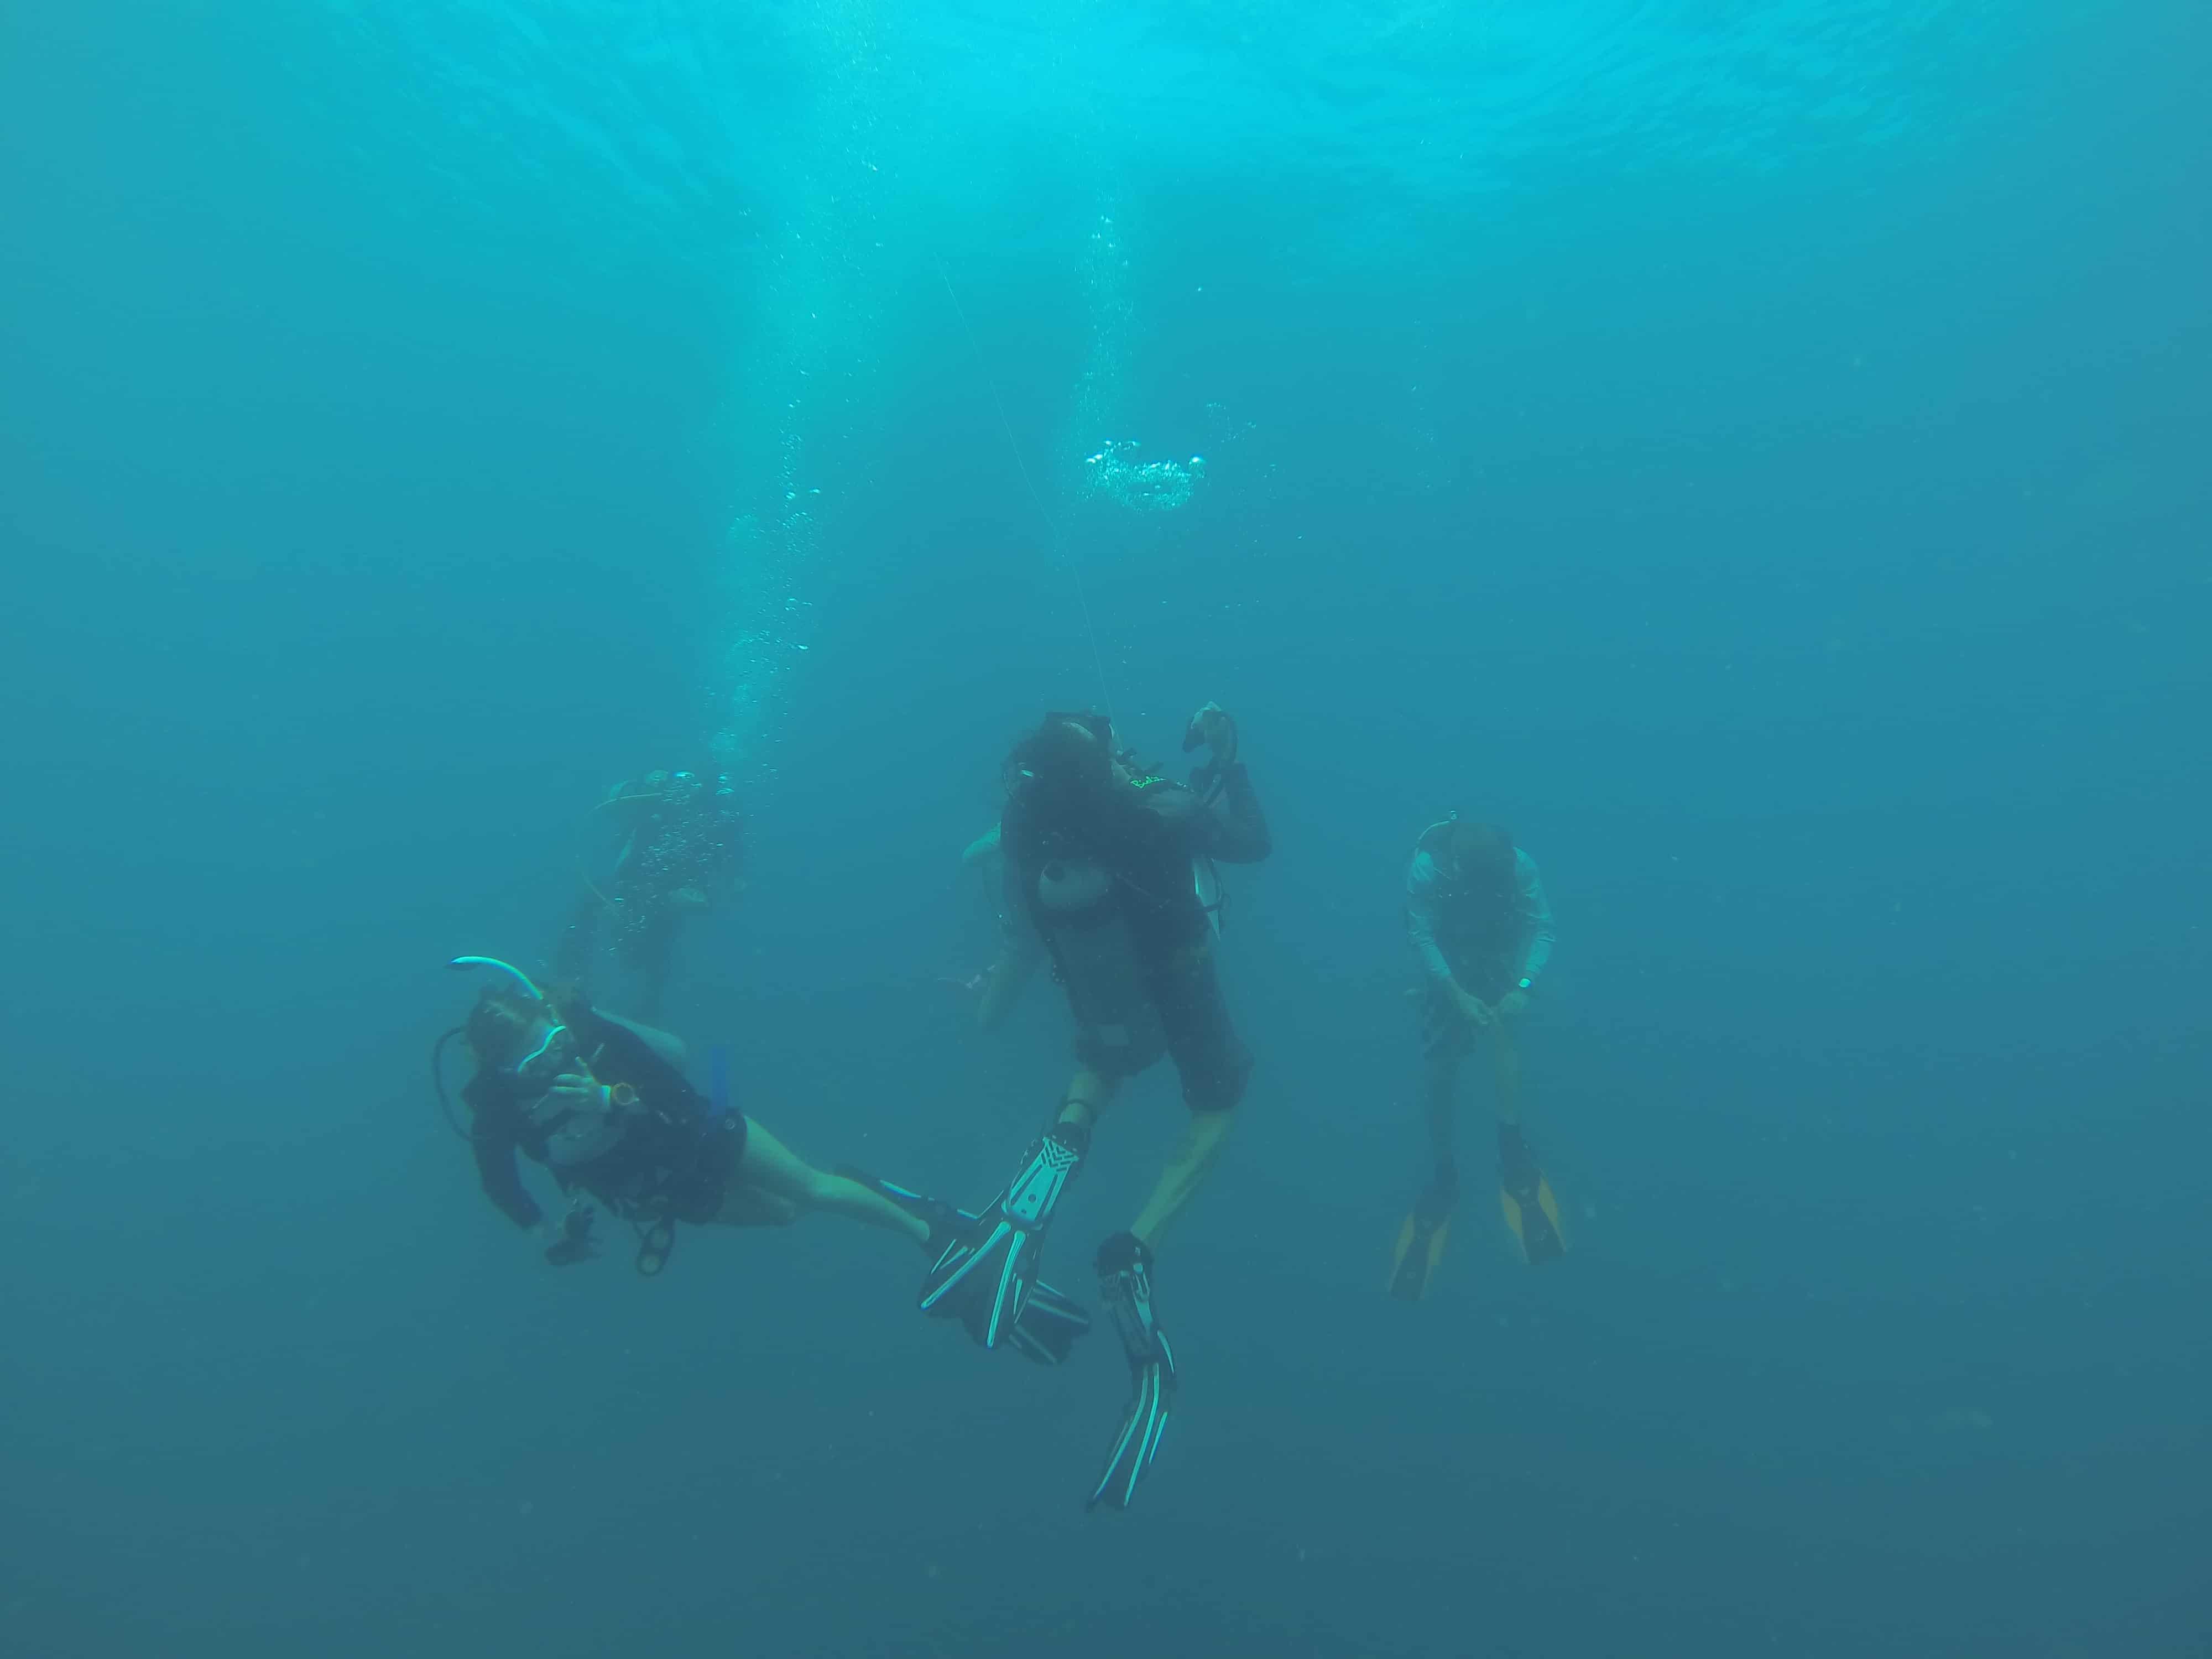 costarica, dive, scuba, PADI, oceansunlimited